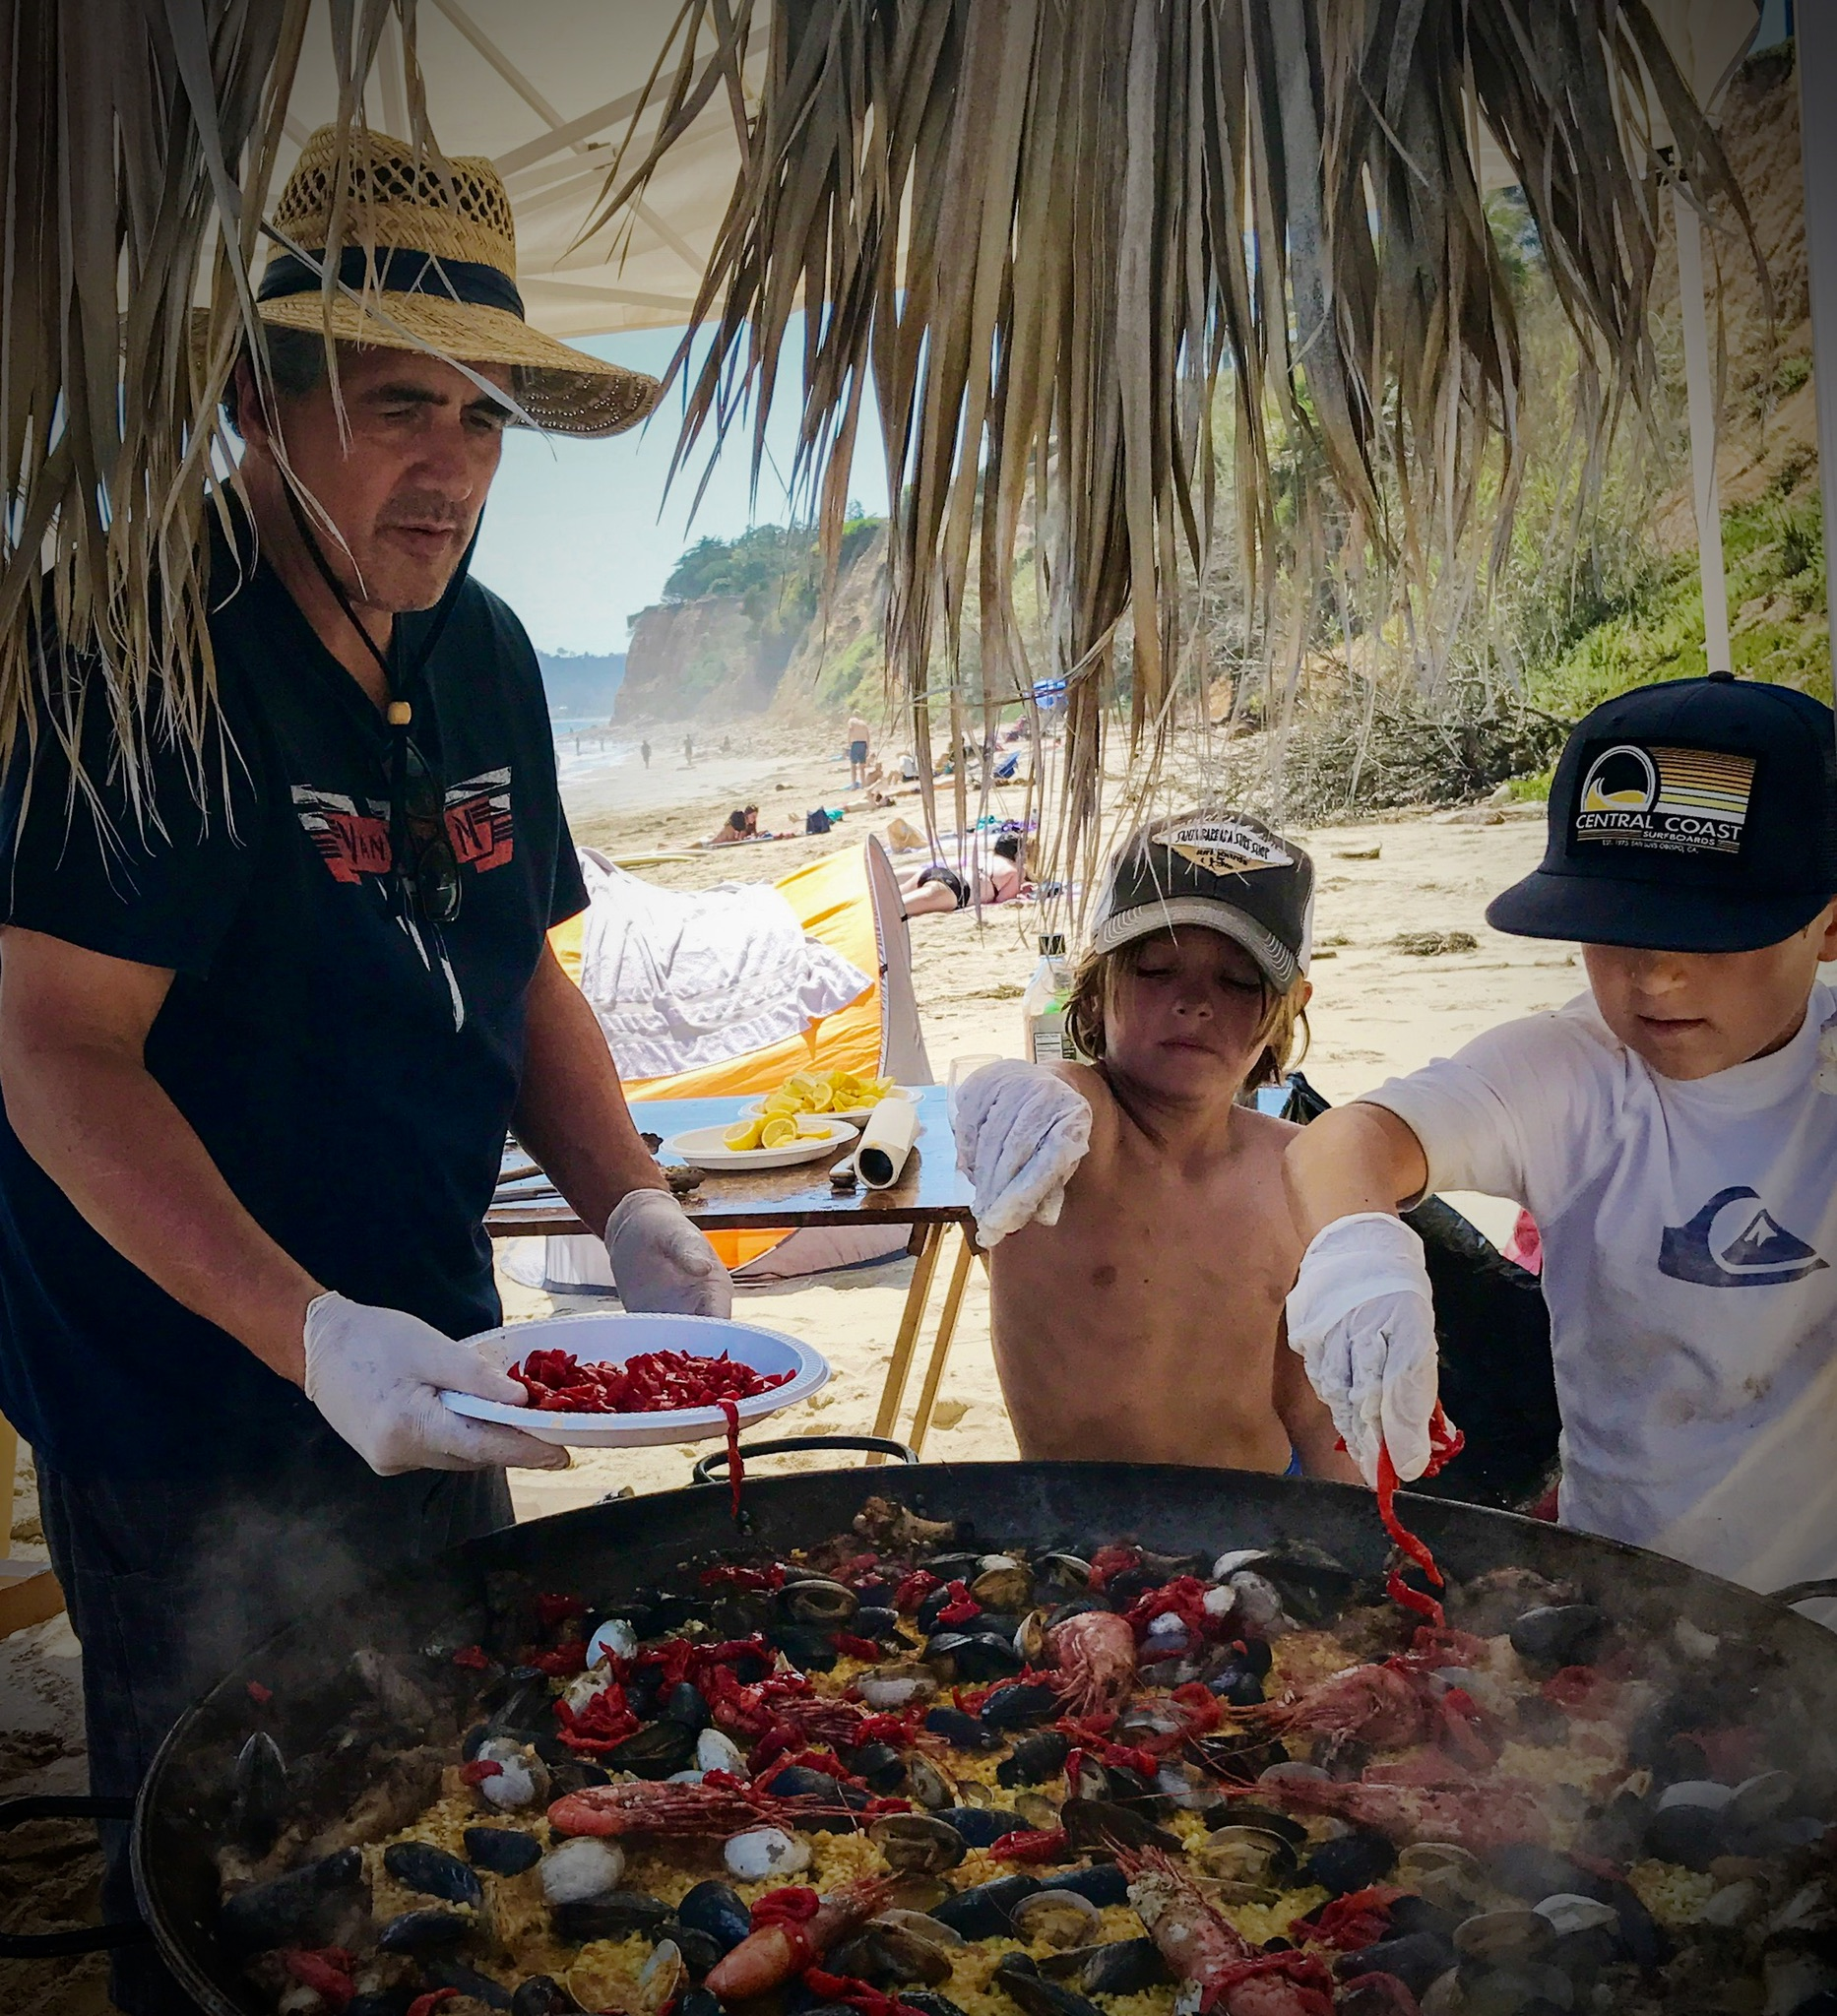 bomba-paella-catering-butterfly-beach3.jpg